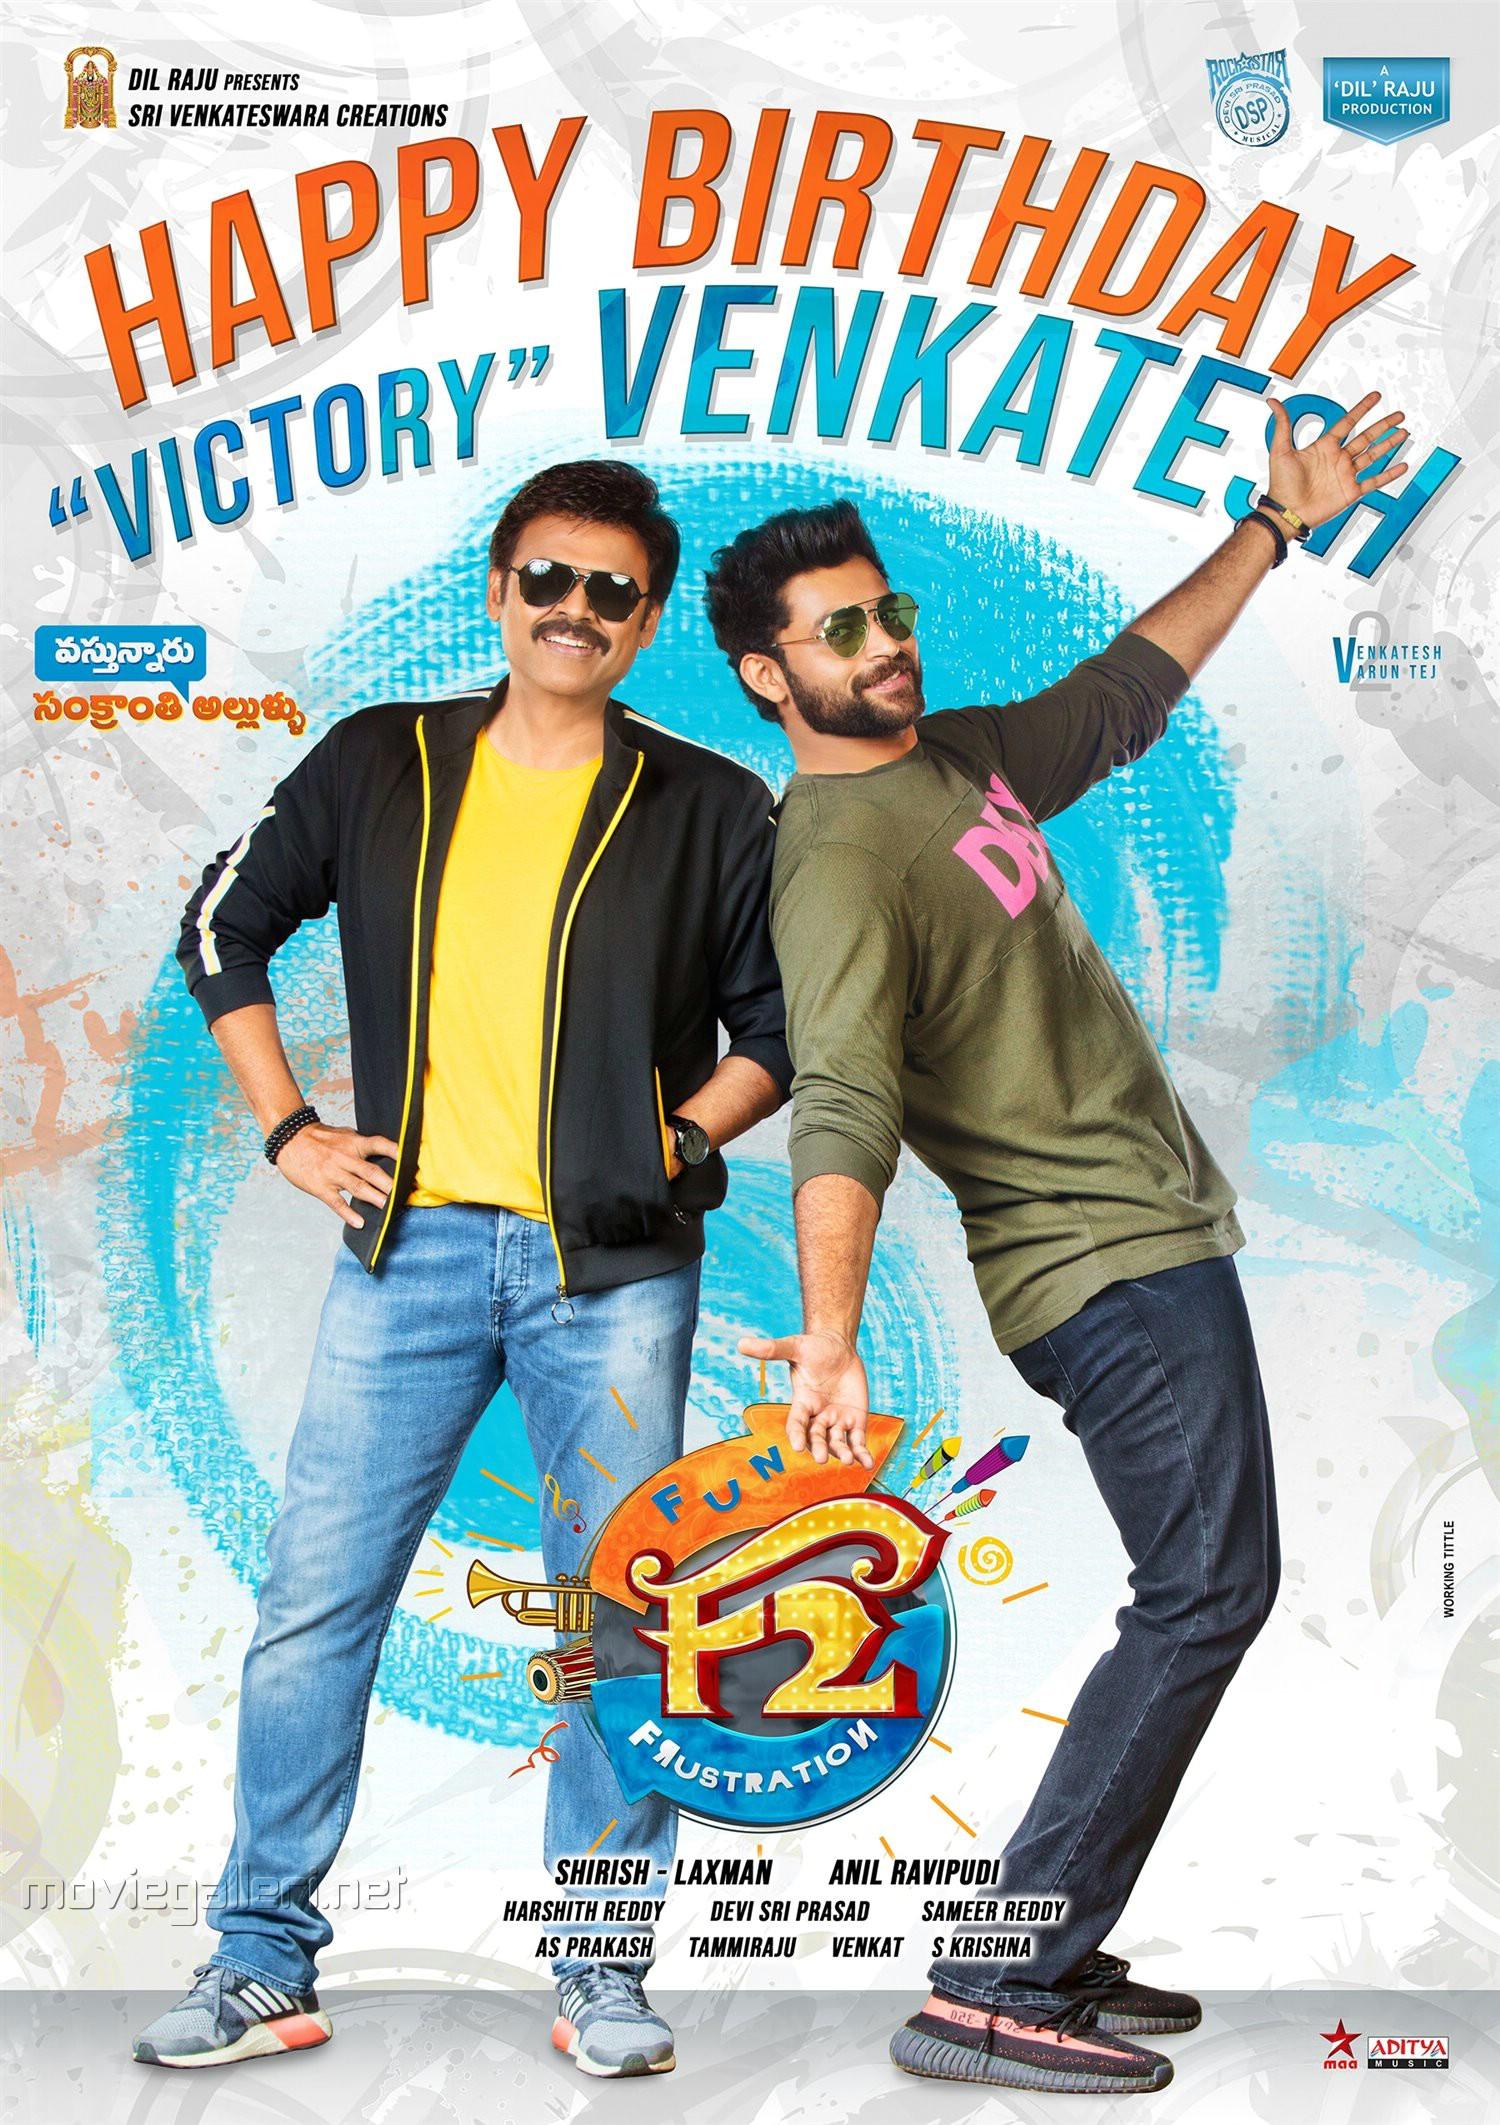 F2 Movie Venkatesh Birthday Wishes Posters